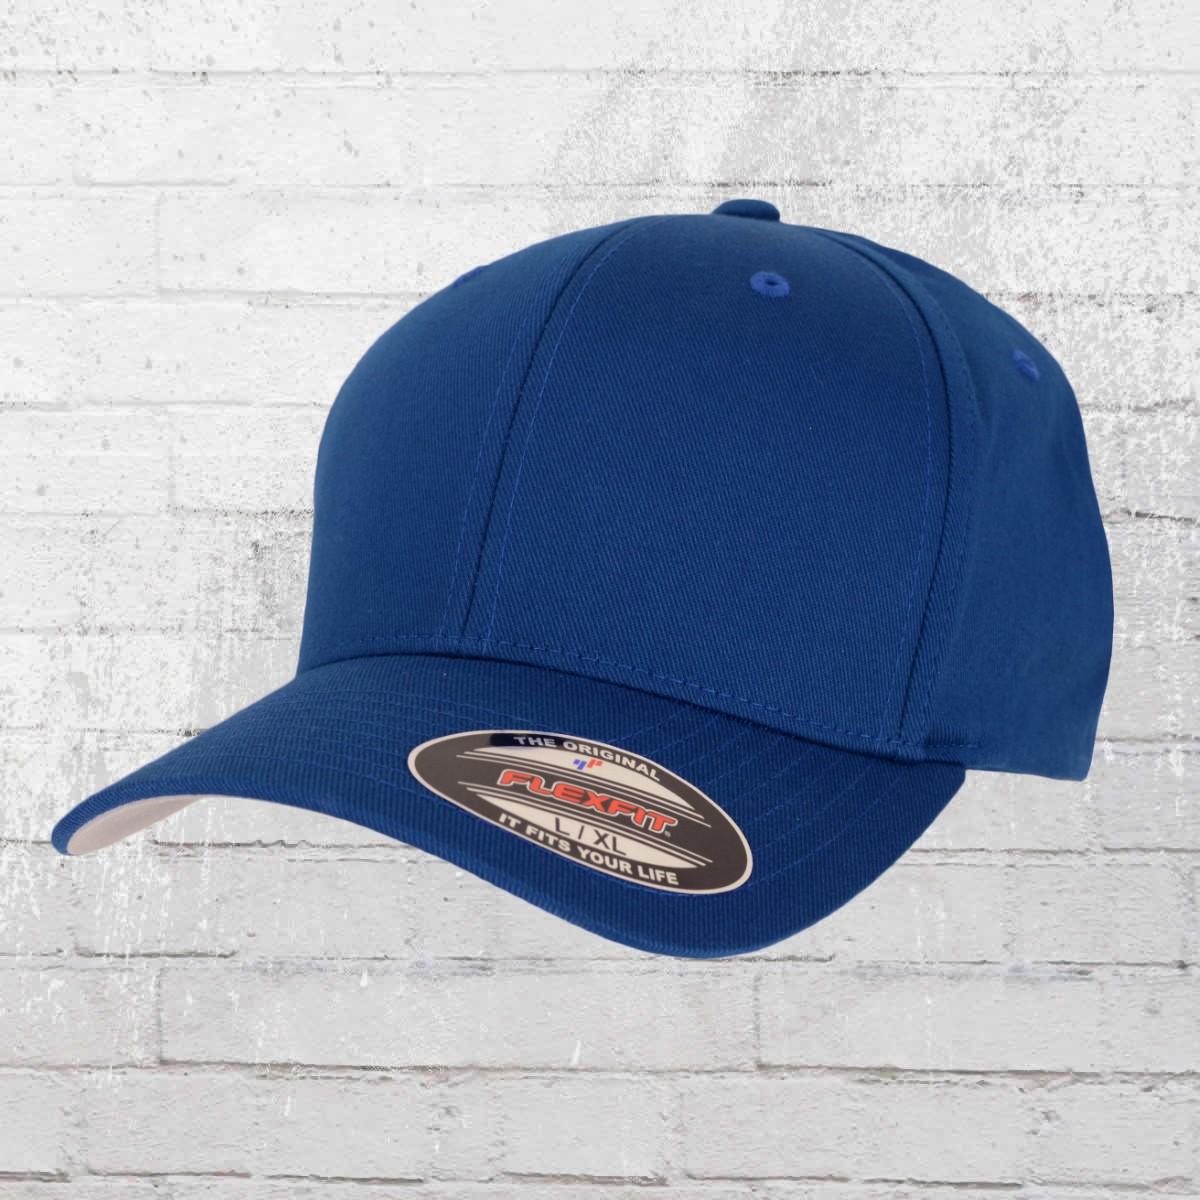 dbcb8fa05b2e6 Flexfit Blanko Cap royal blue. ›‹ «